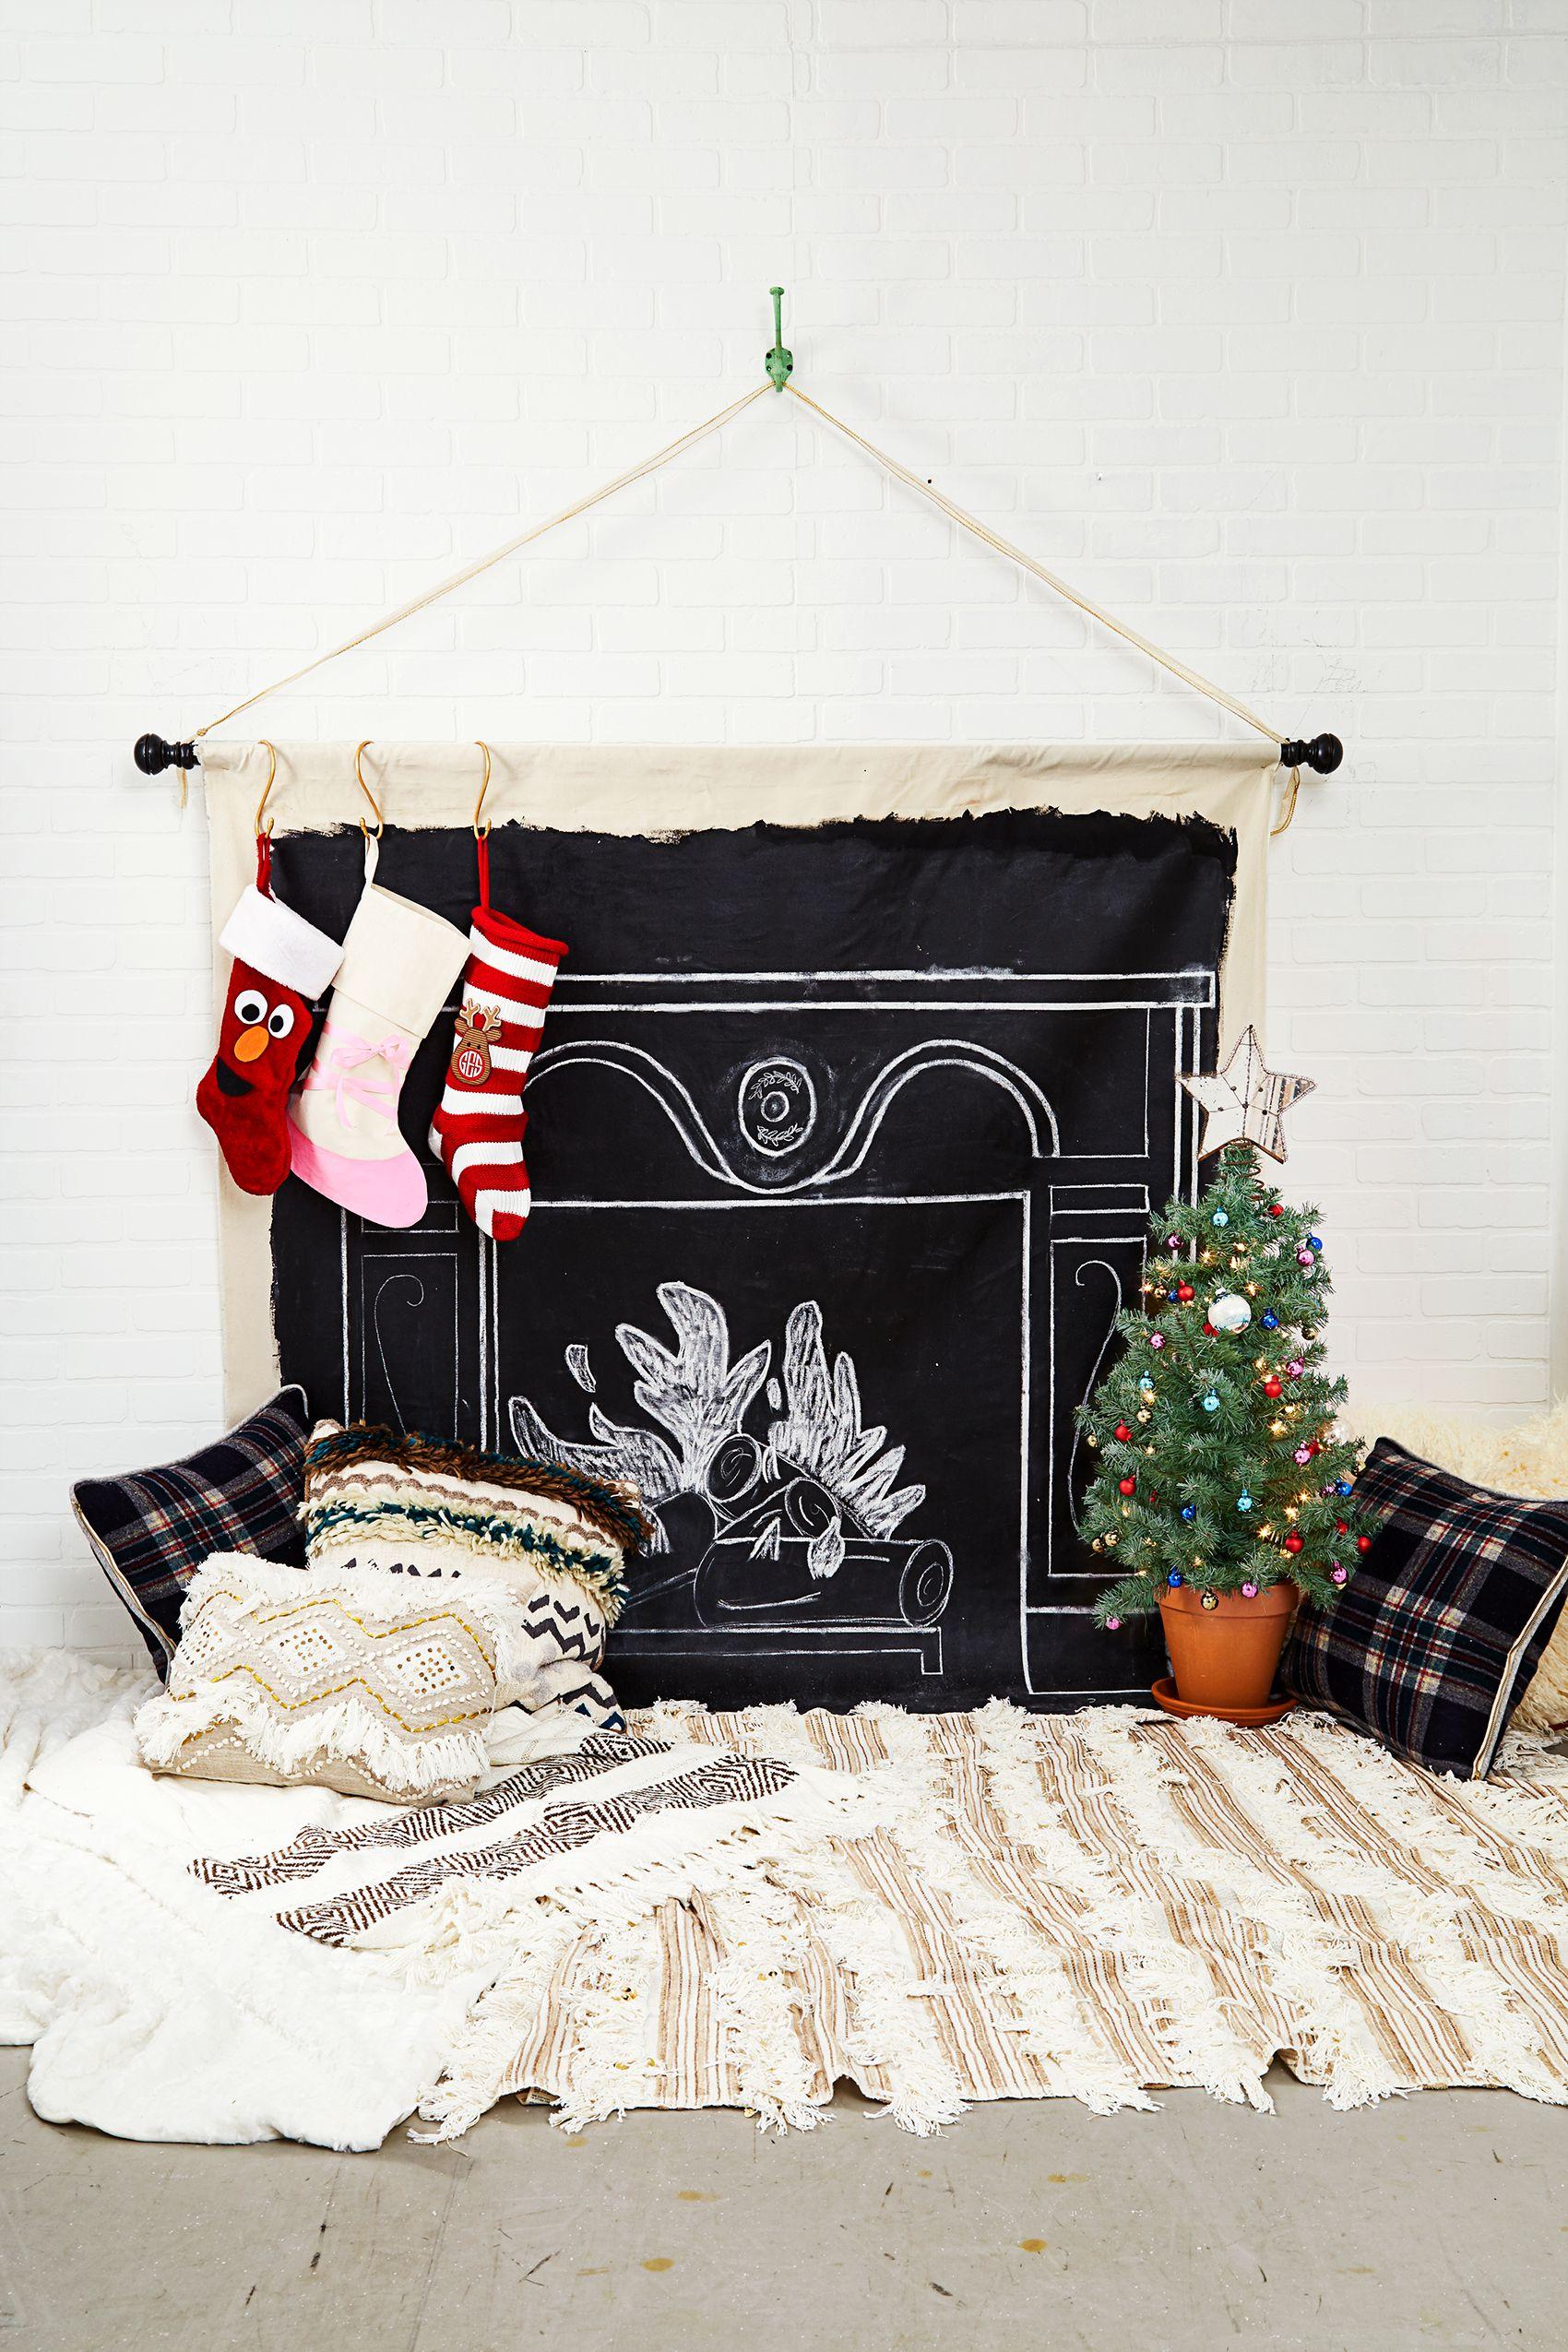 30 Easy Diy Christmas Decorations Homemade Holiday Decor Ideas